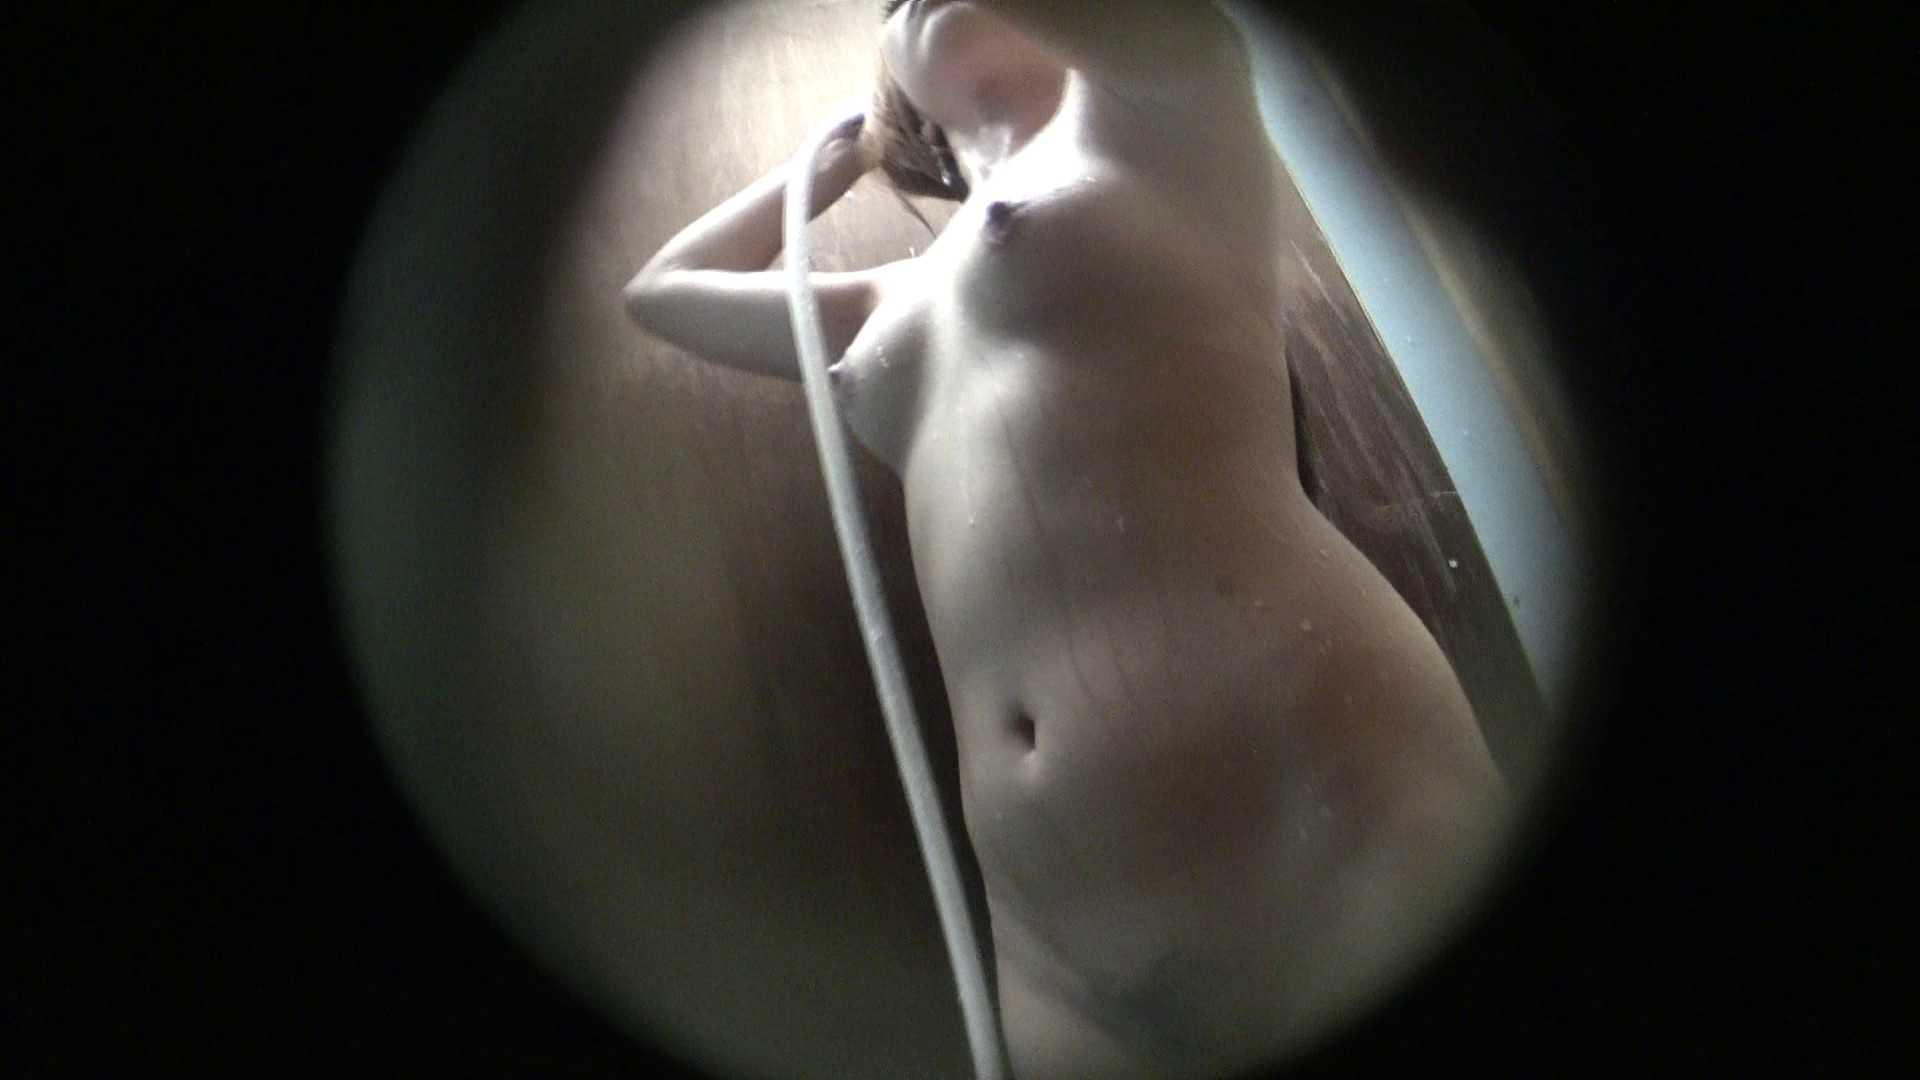 NO.03 ムッチリ色白ボディーに少し大きな乳輪 シャワー スケベ動画紹介 90枚 33